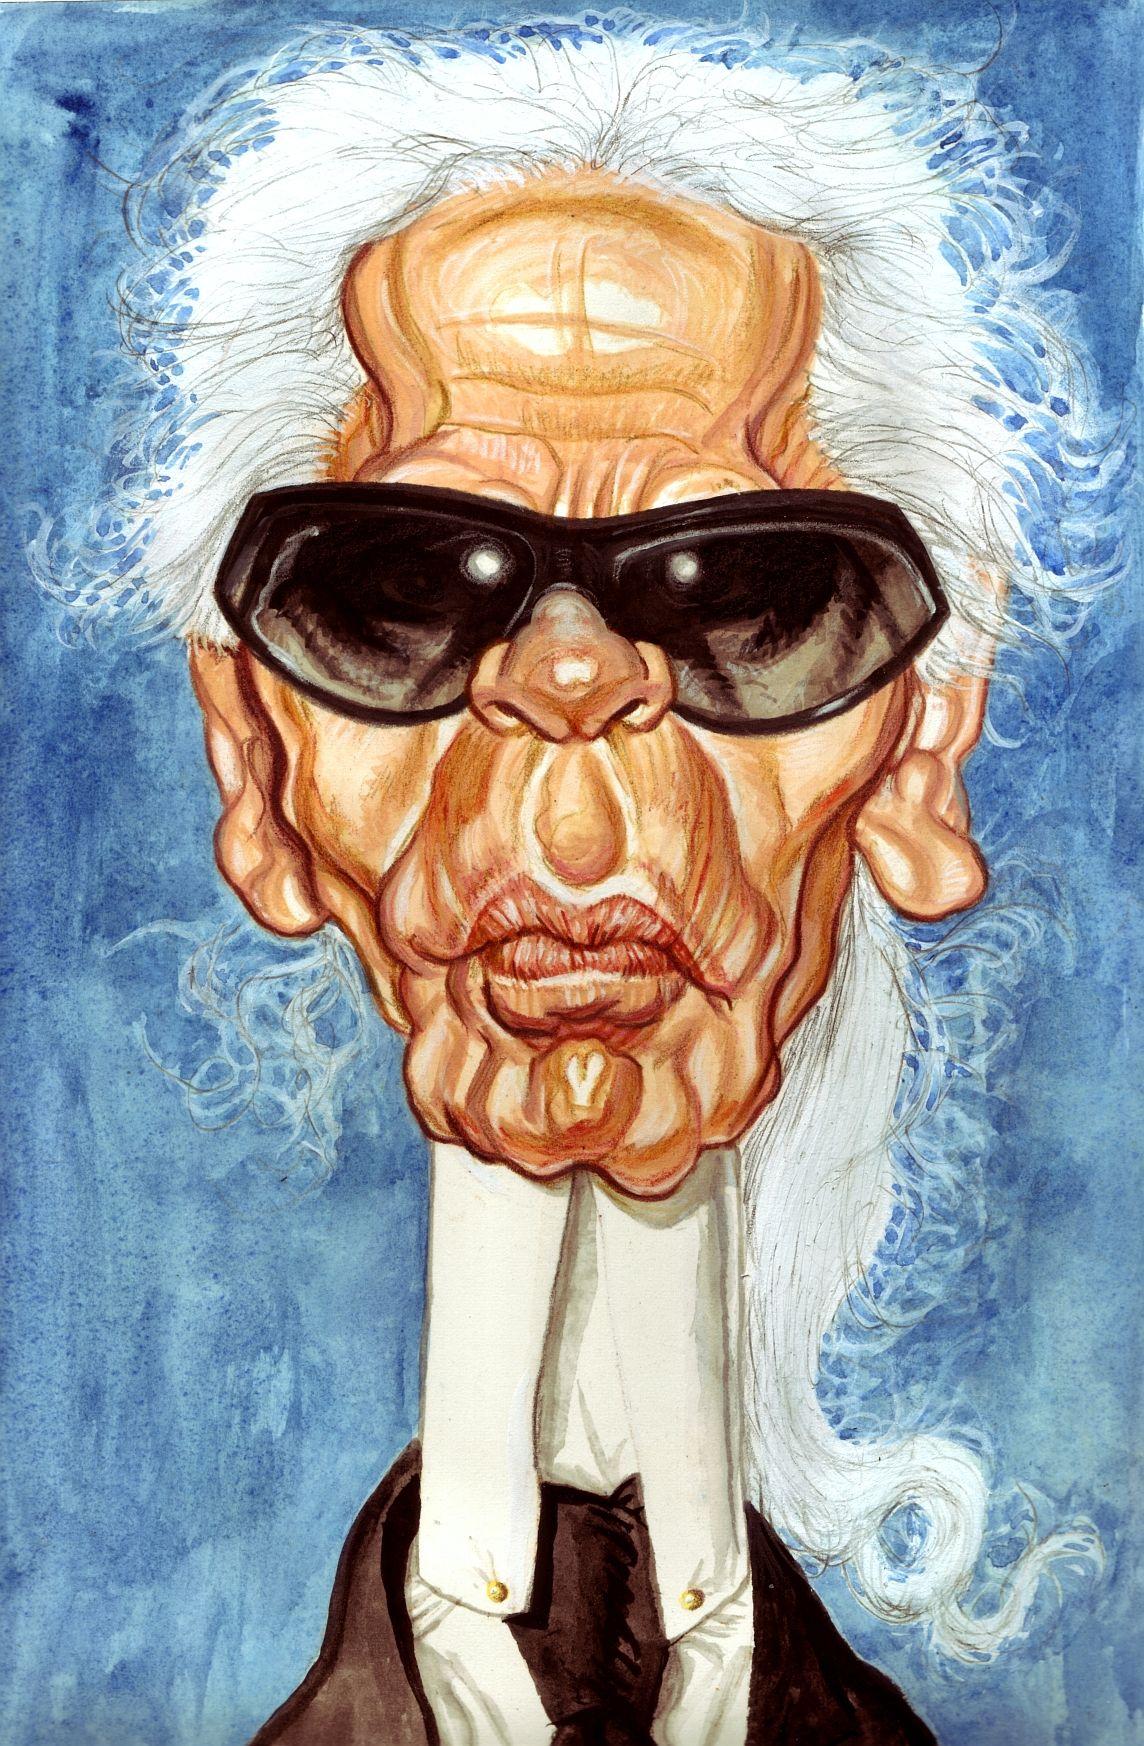 Pin By Helean Zechinatti Ferreira On Caricatures In 2020 Caricature Drawing Caricature Funny Caricatures